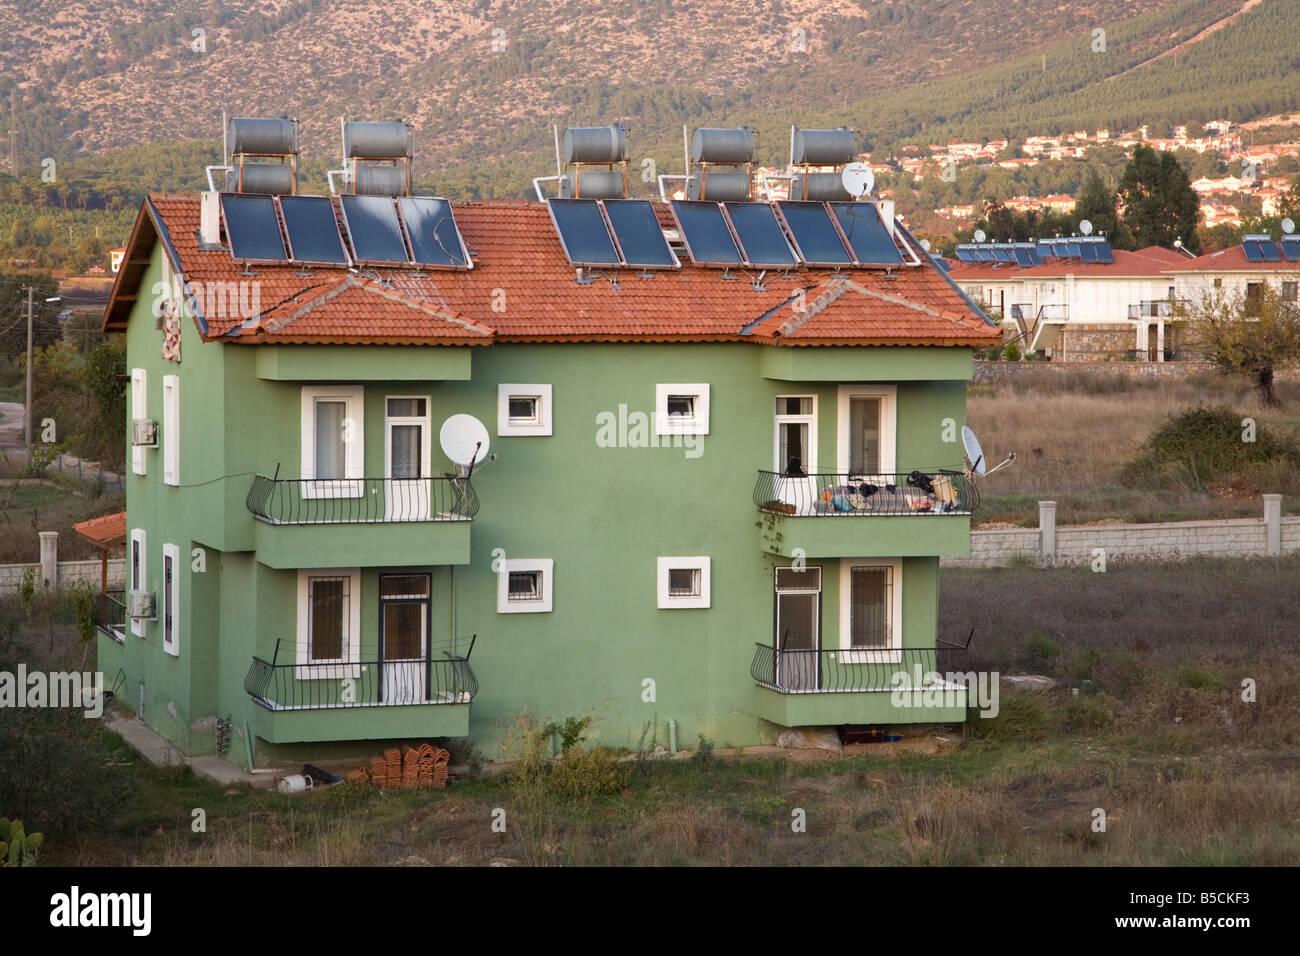 Solar panels on a apartment rooftops in Hisoranu, near Fethiye Turkey - Stock Image